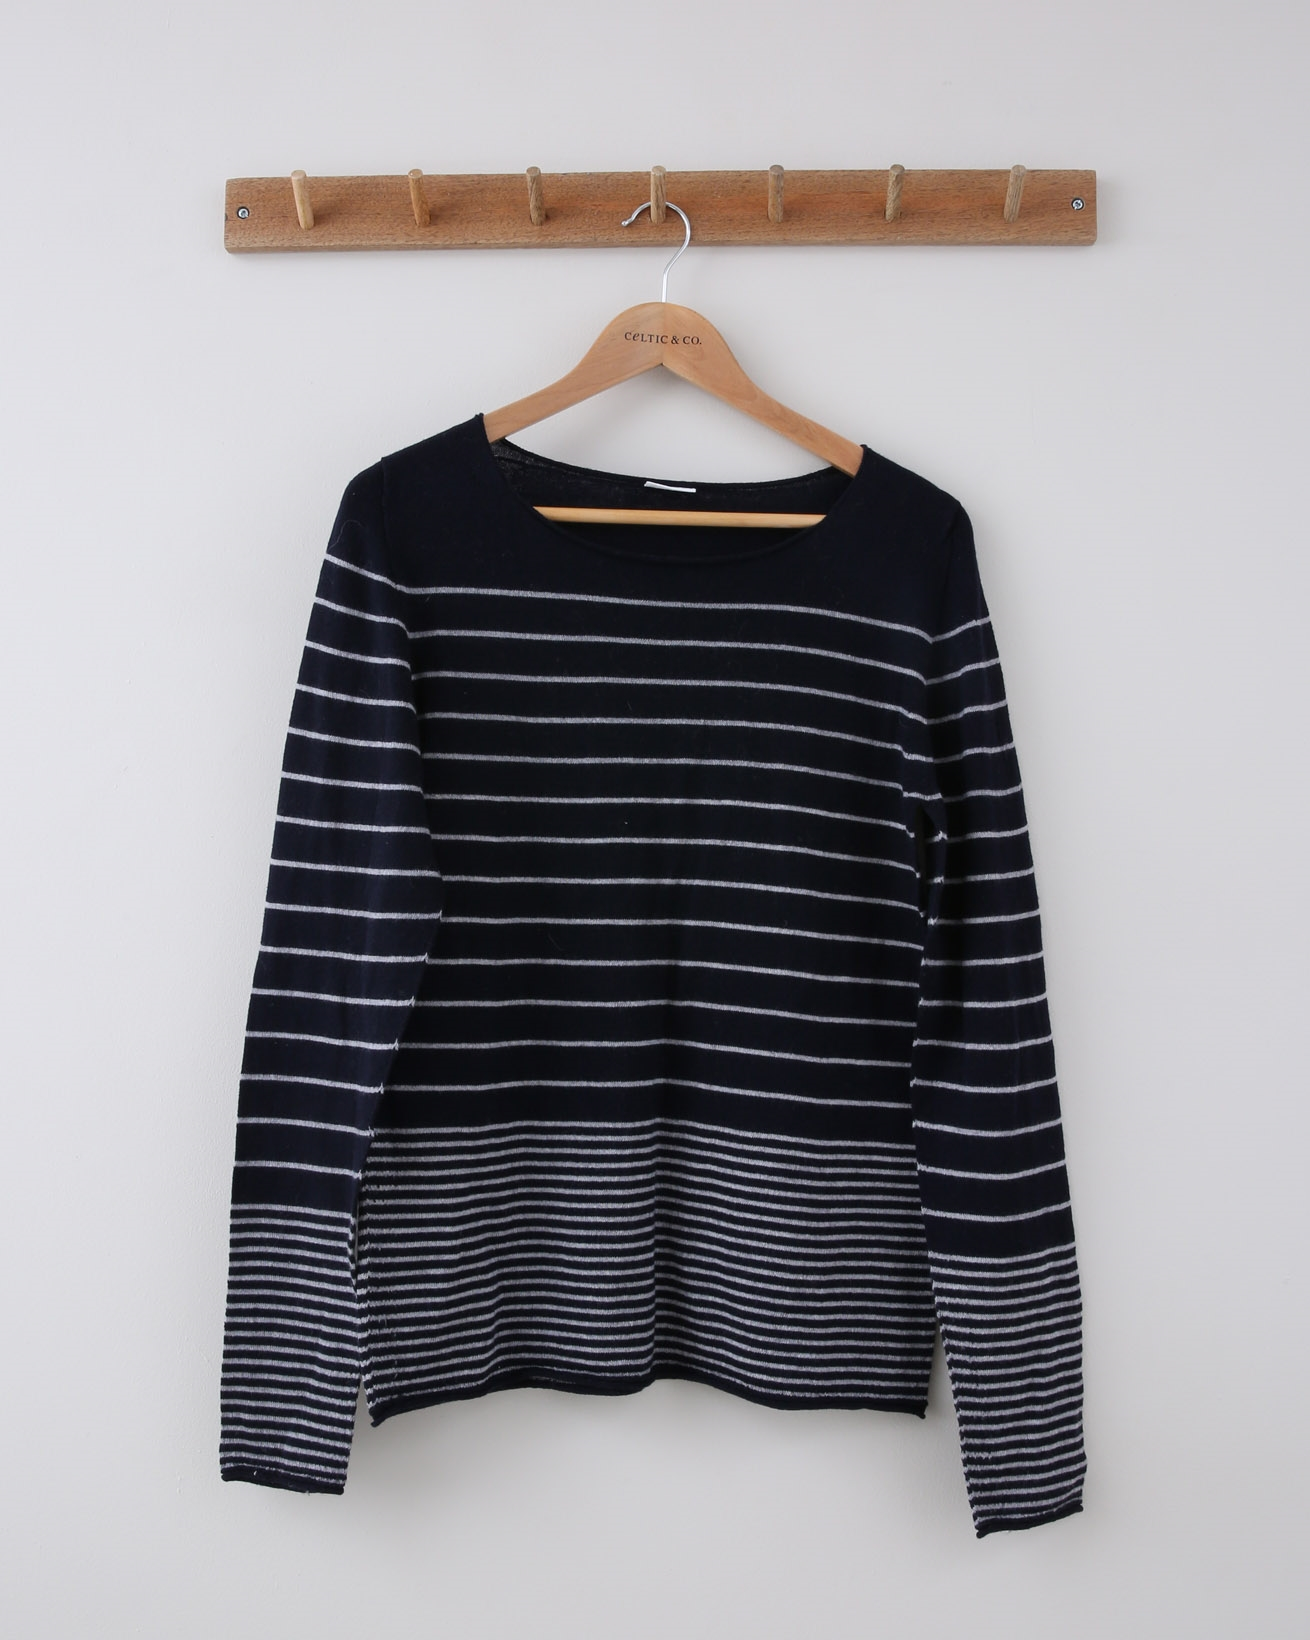 Merino Crew Fine Knit - Small - Navy & Ecru Graduated Stripe - 1144